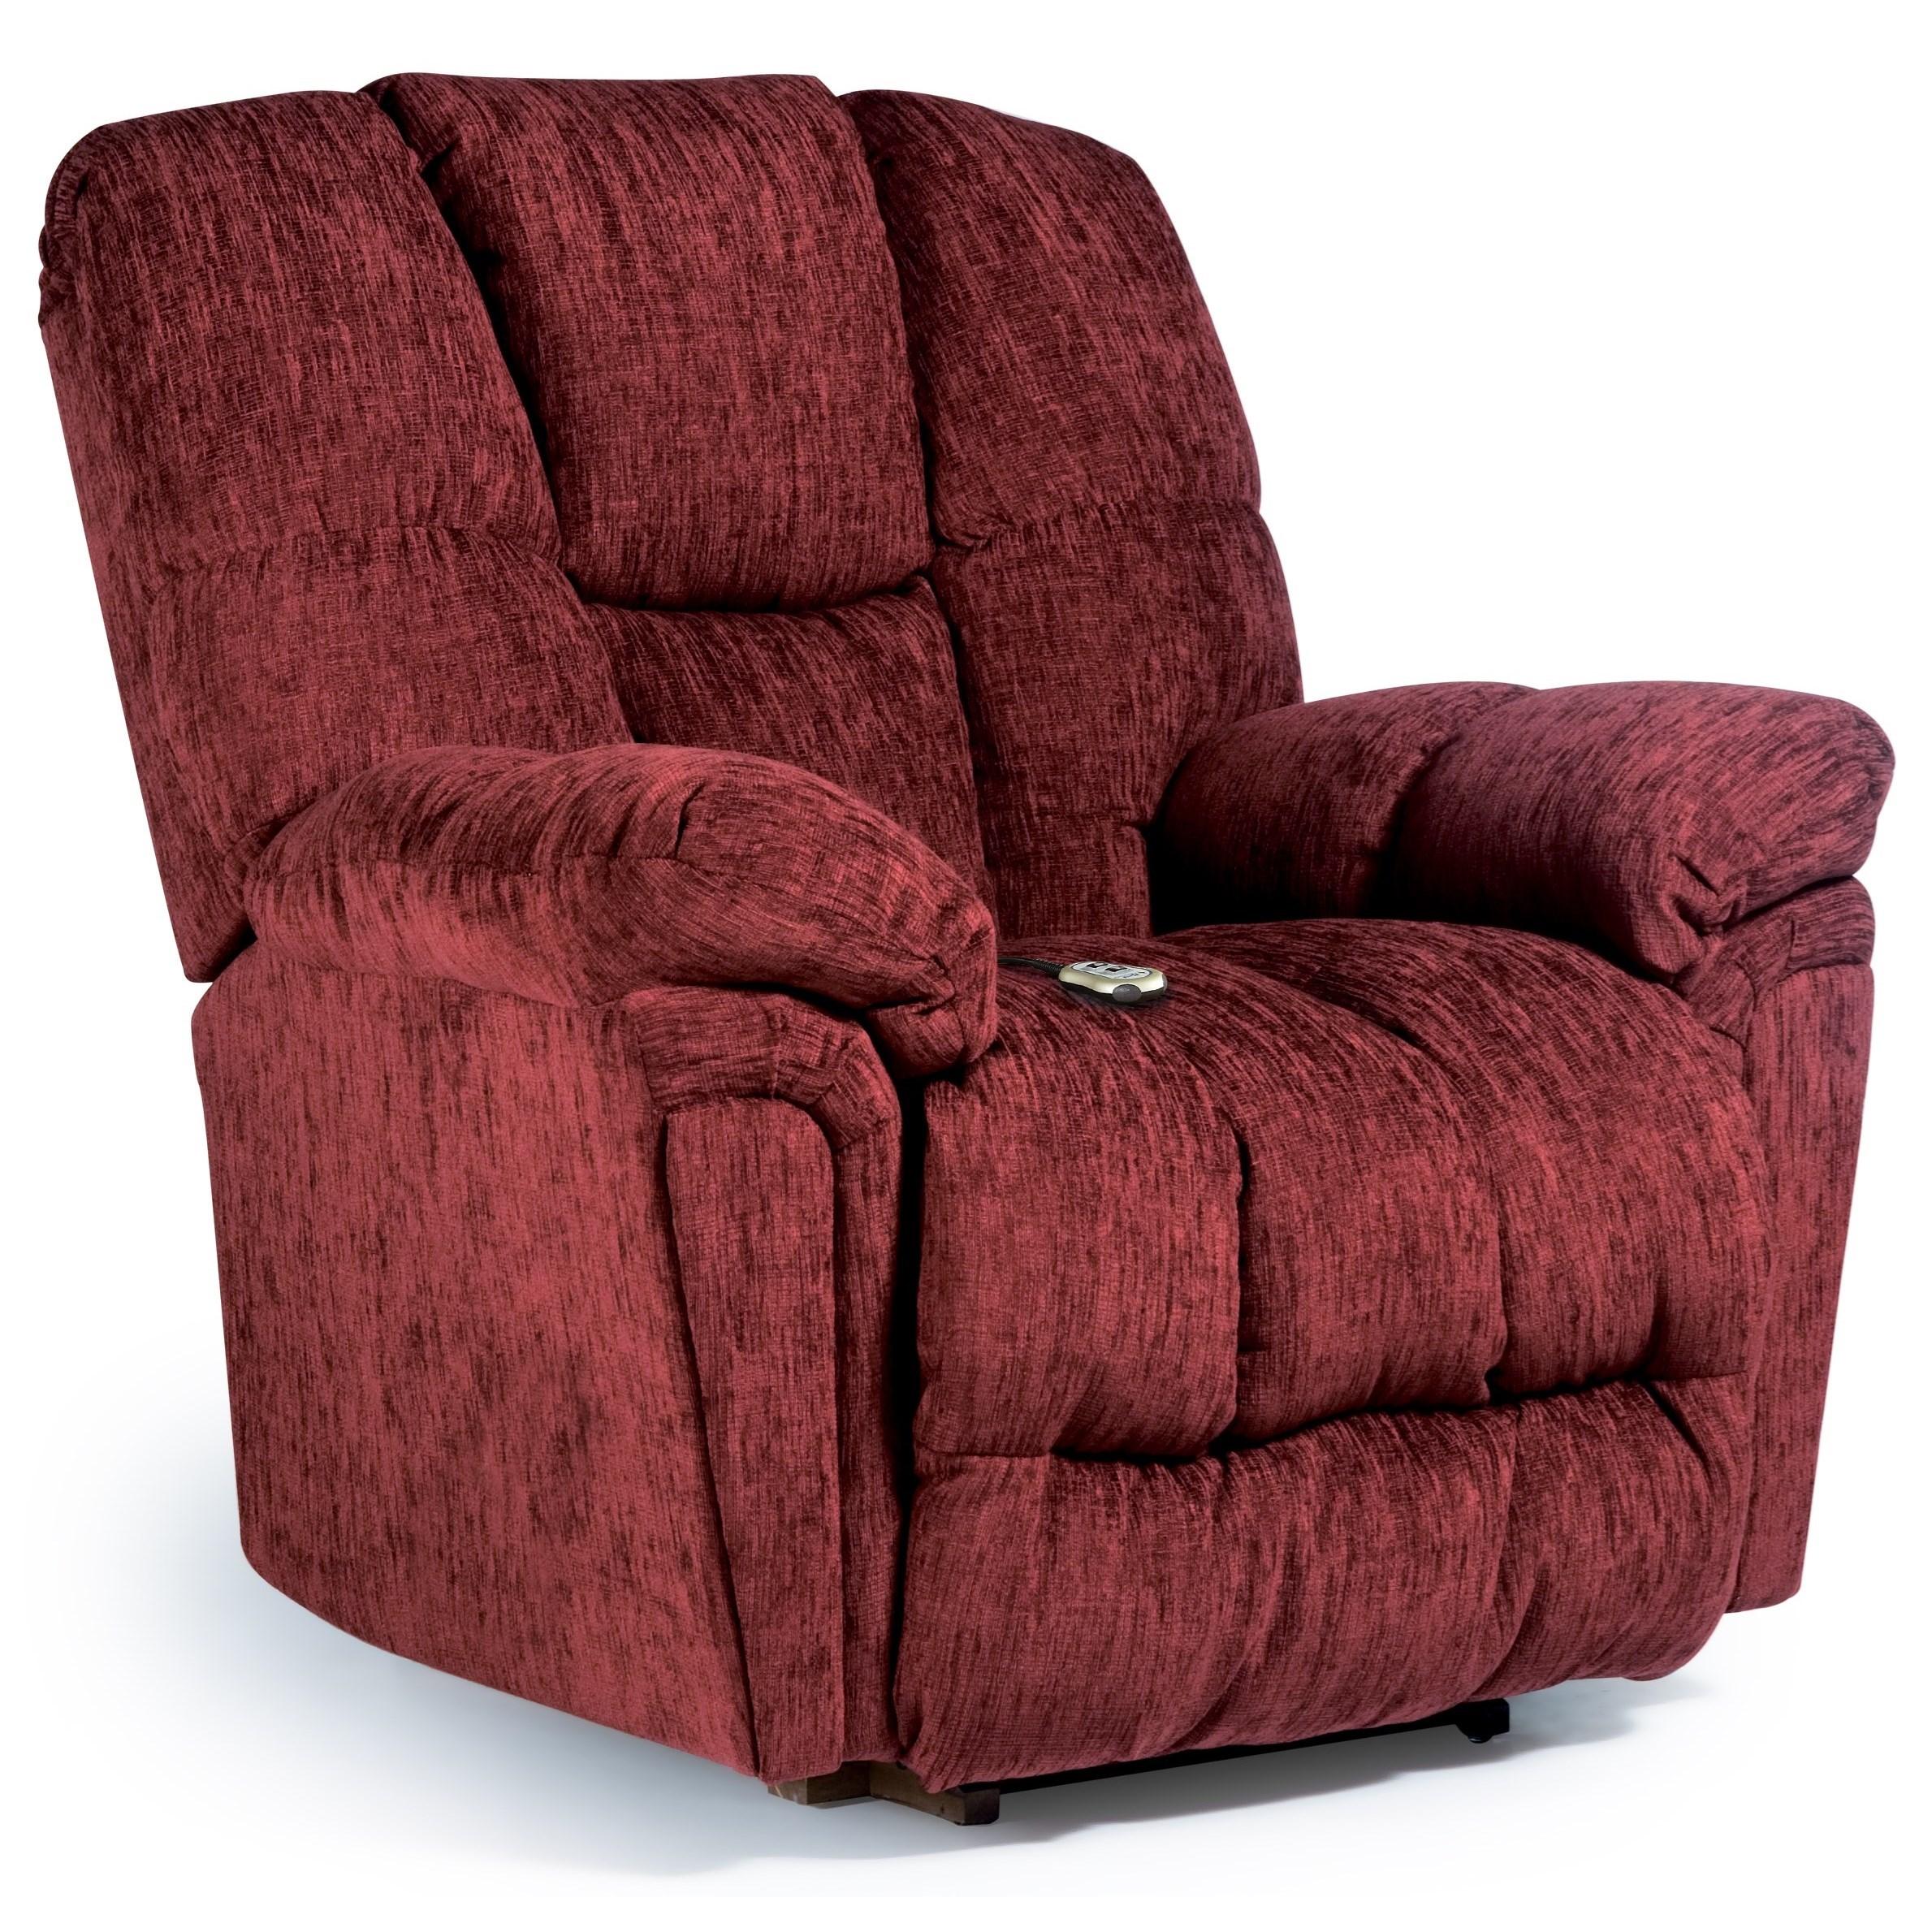 Maurer BodyRest Lift Recliner by Best Home Furnishings at Saugerties Furniture Mart